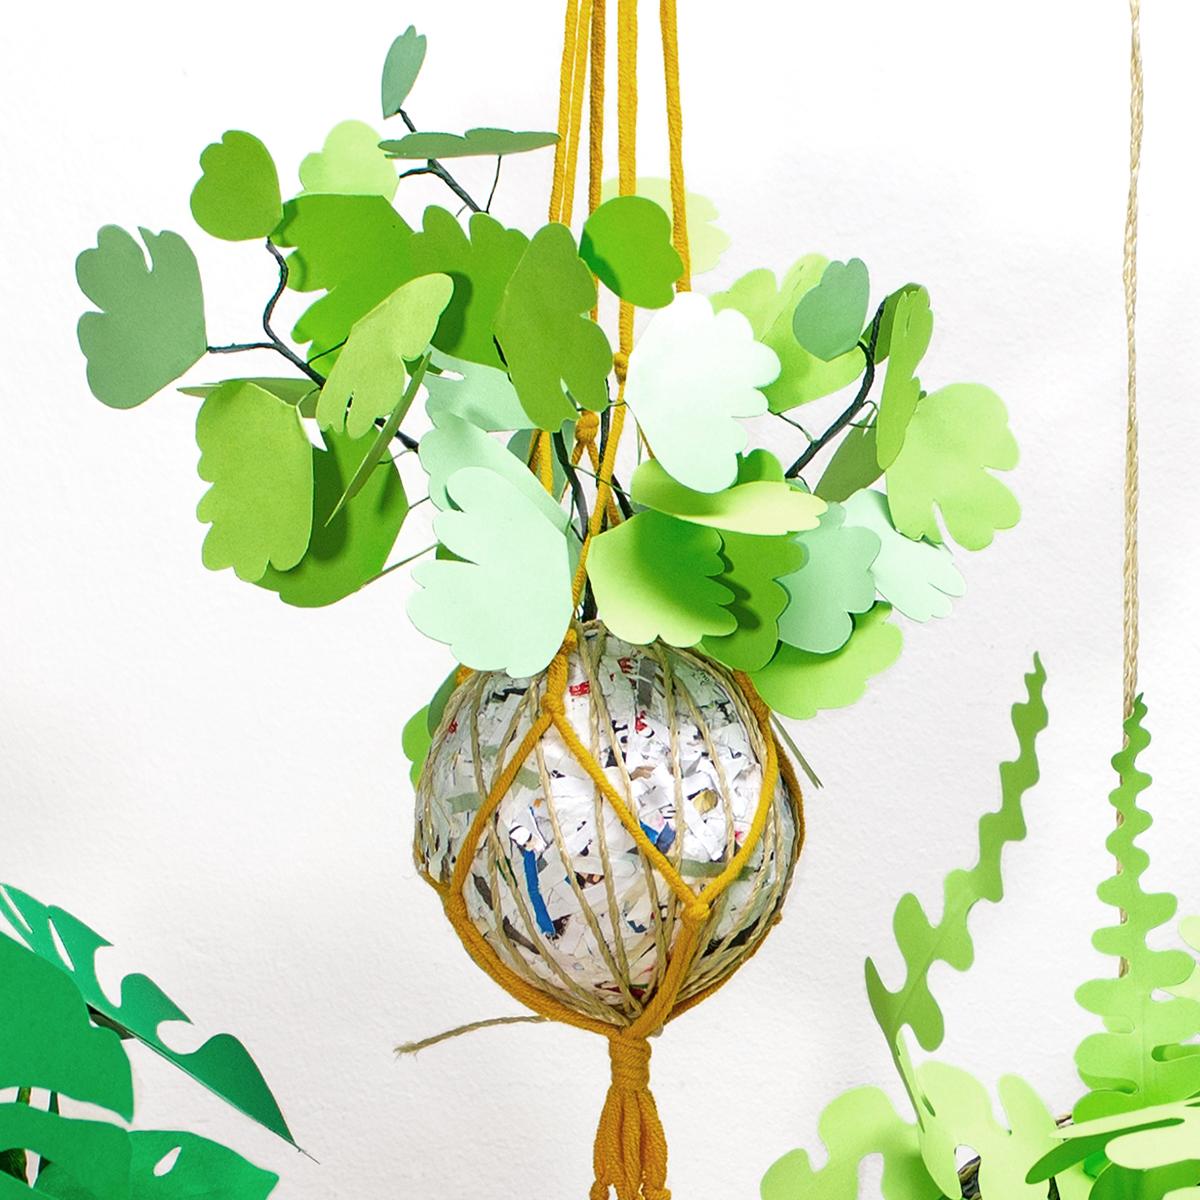 jungla, plantas de papel. kokedama helecho1